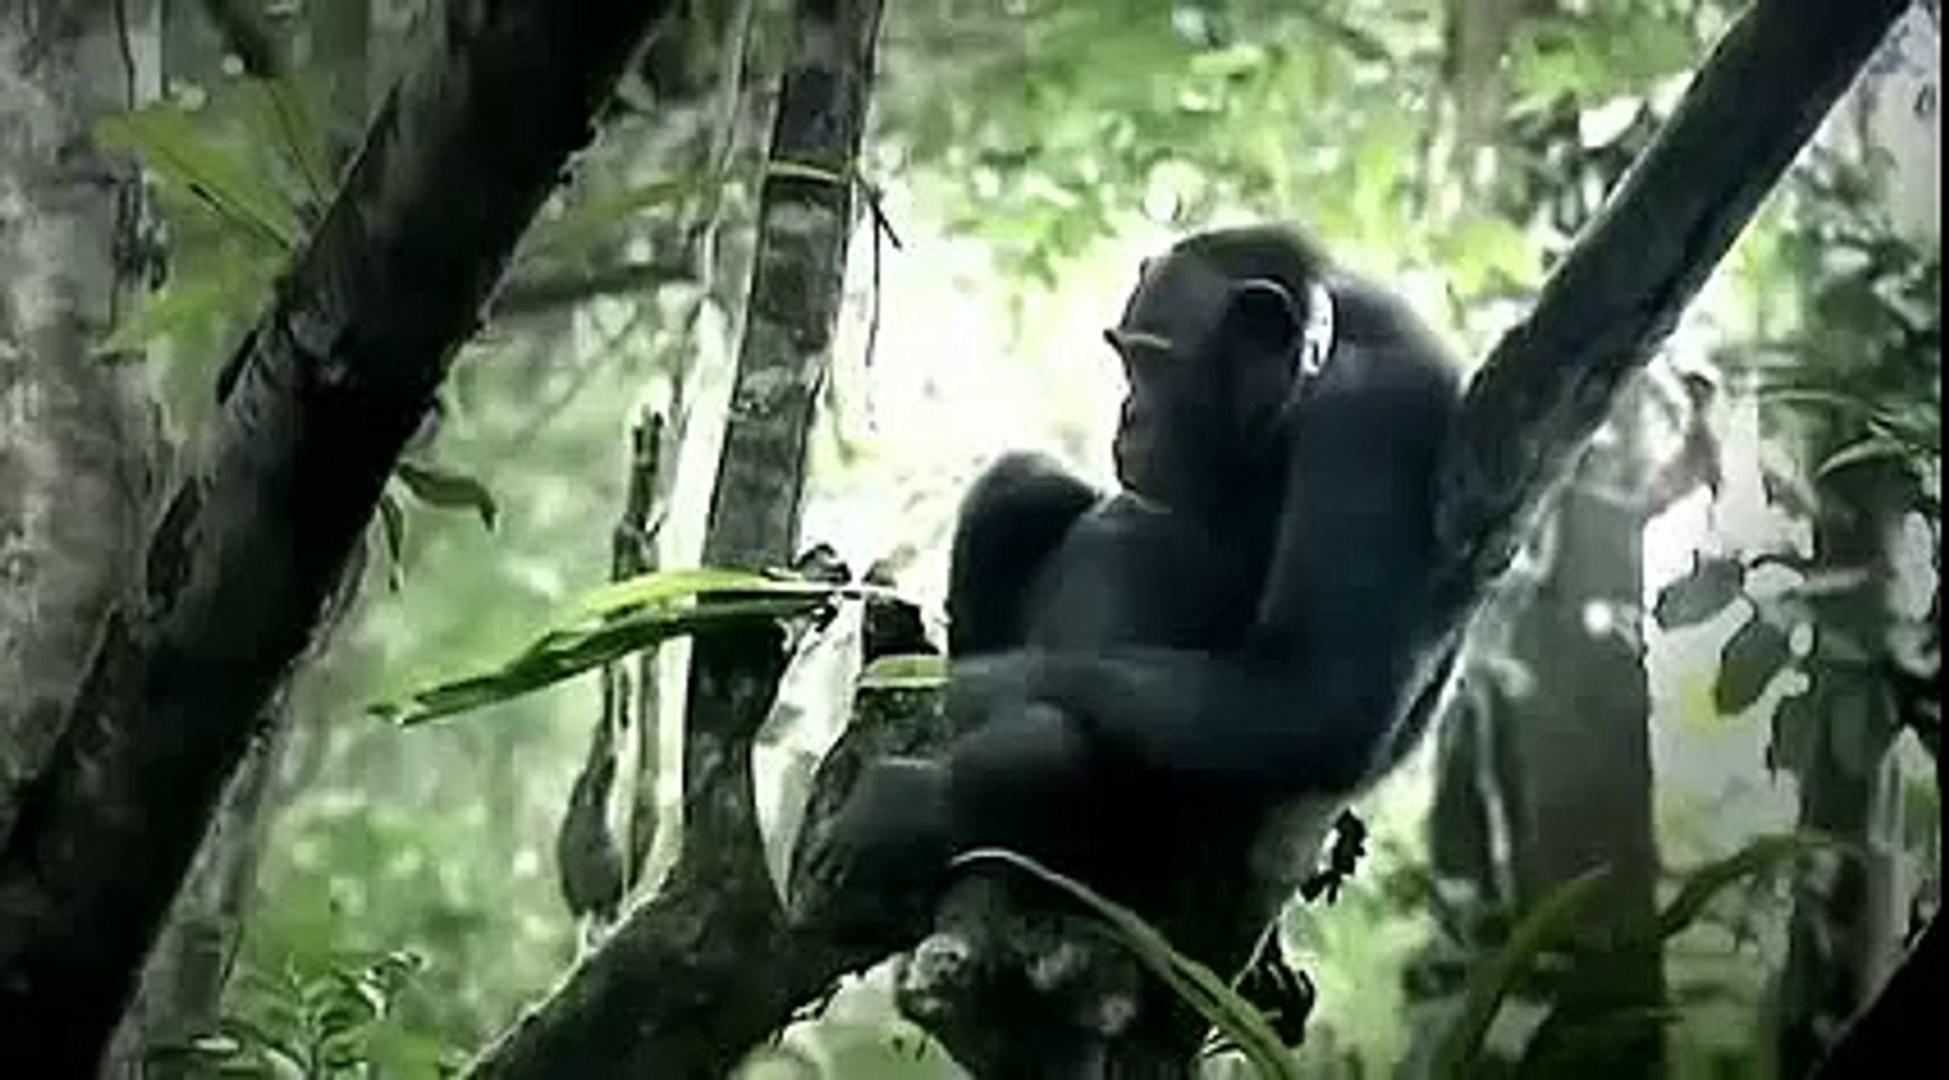 [Nature Documentary] A Chimpanzee's Tale - NEW+ Full Animal Documentary